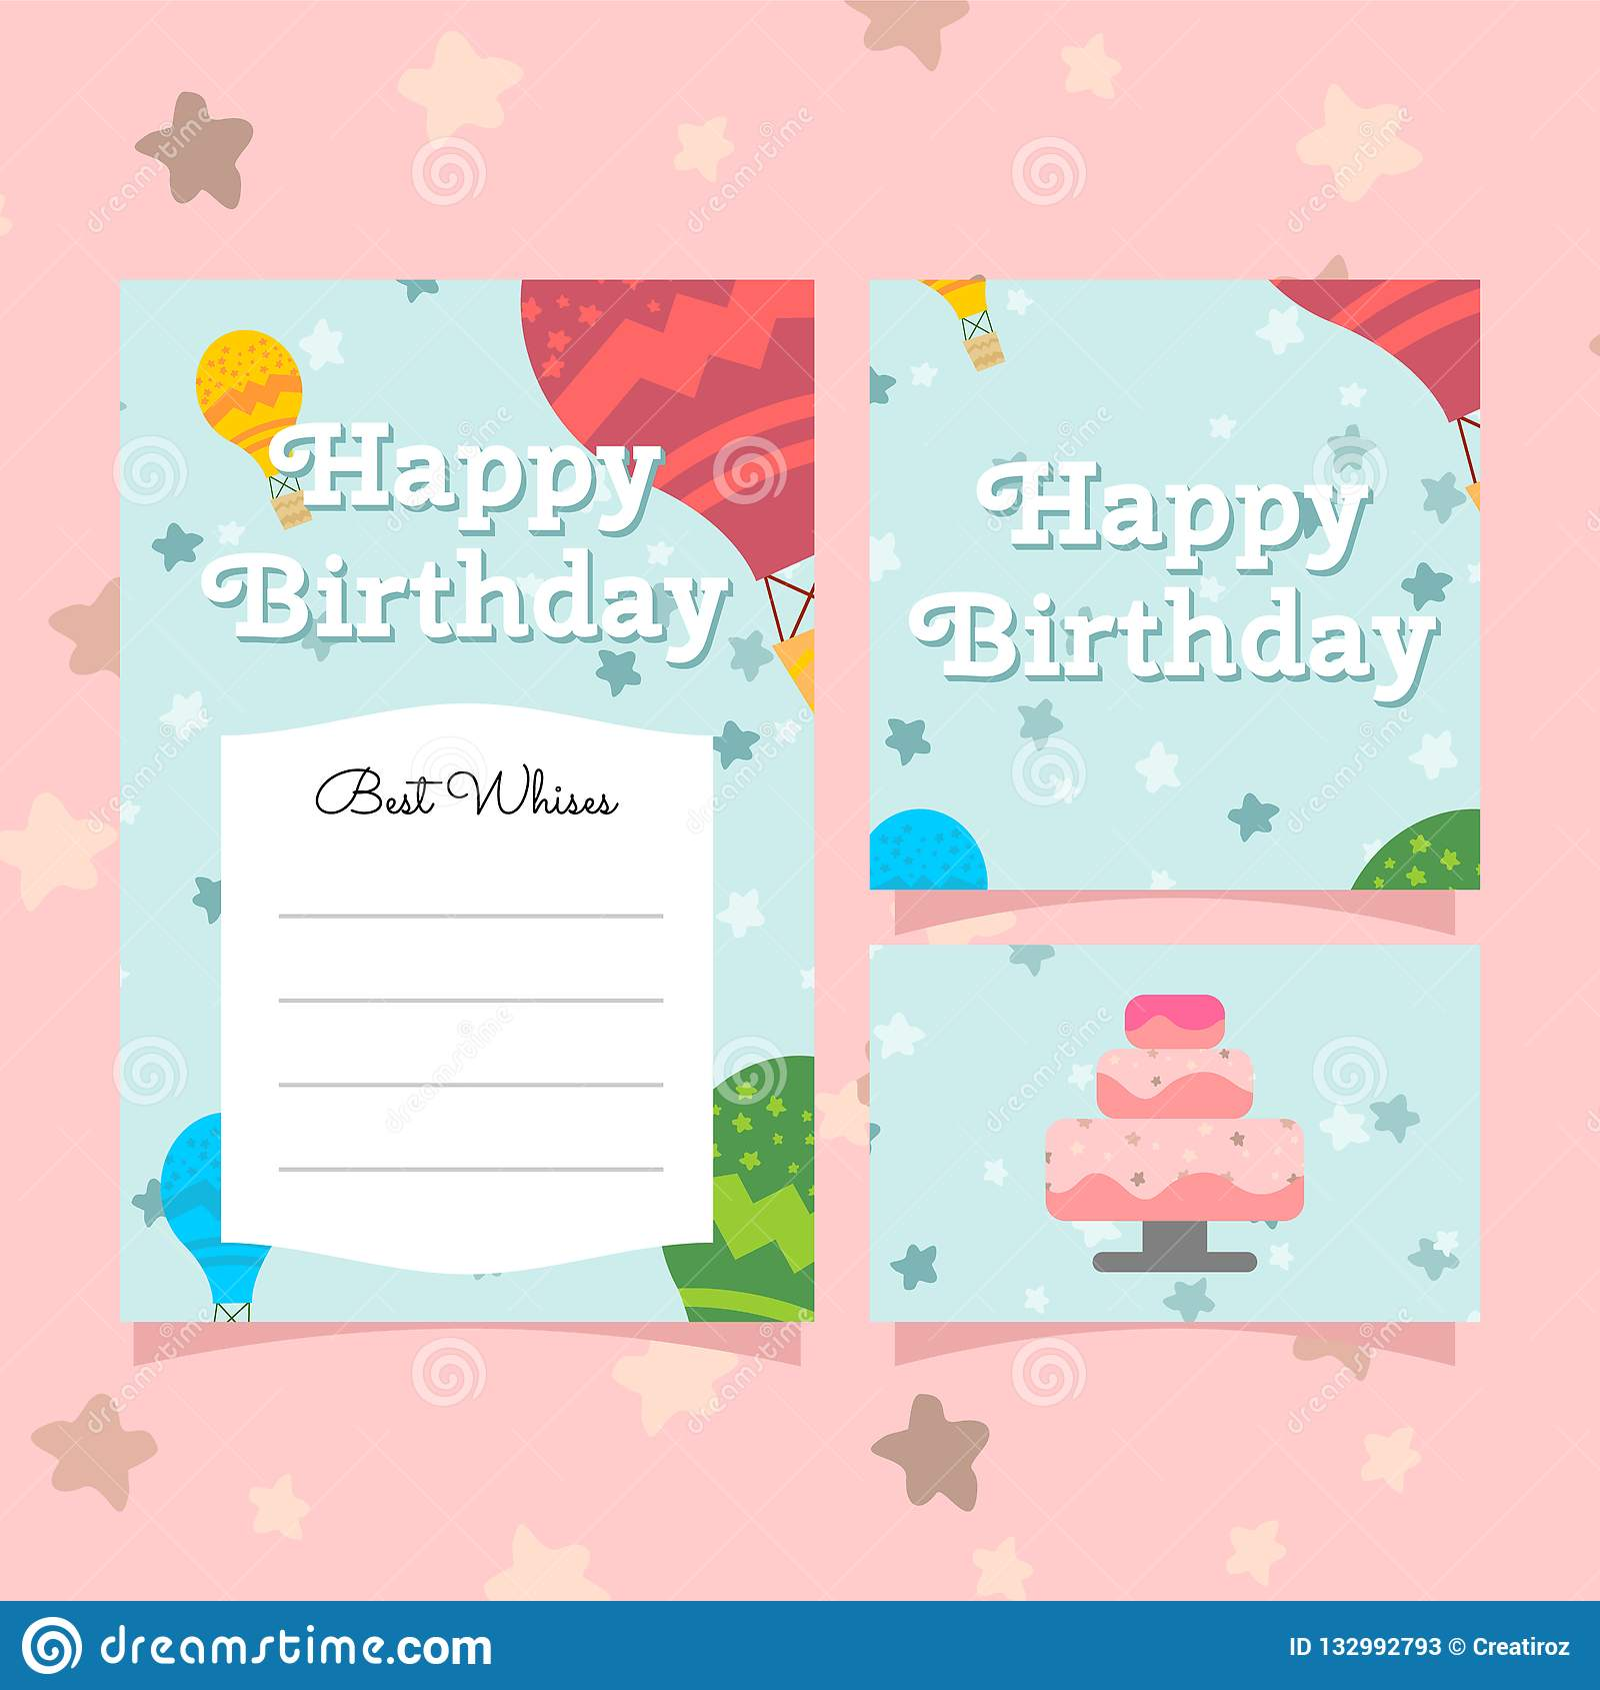 Cute Greeting Birthday Card Invitation Templates Vector Illustration For Childern Girls